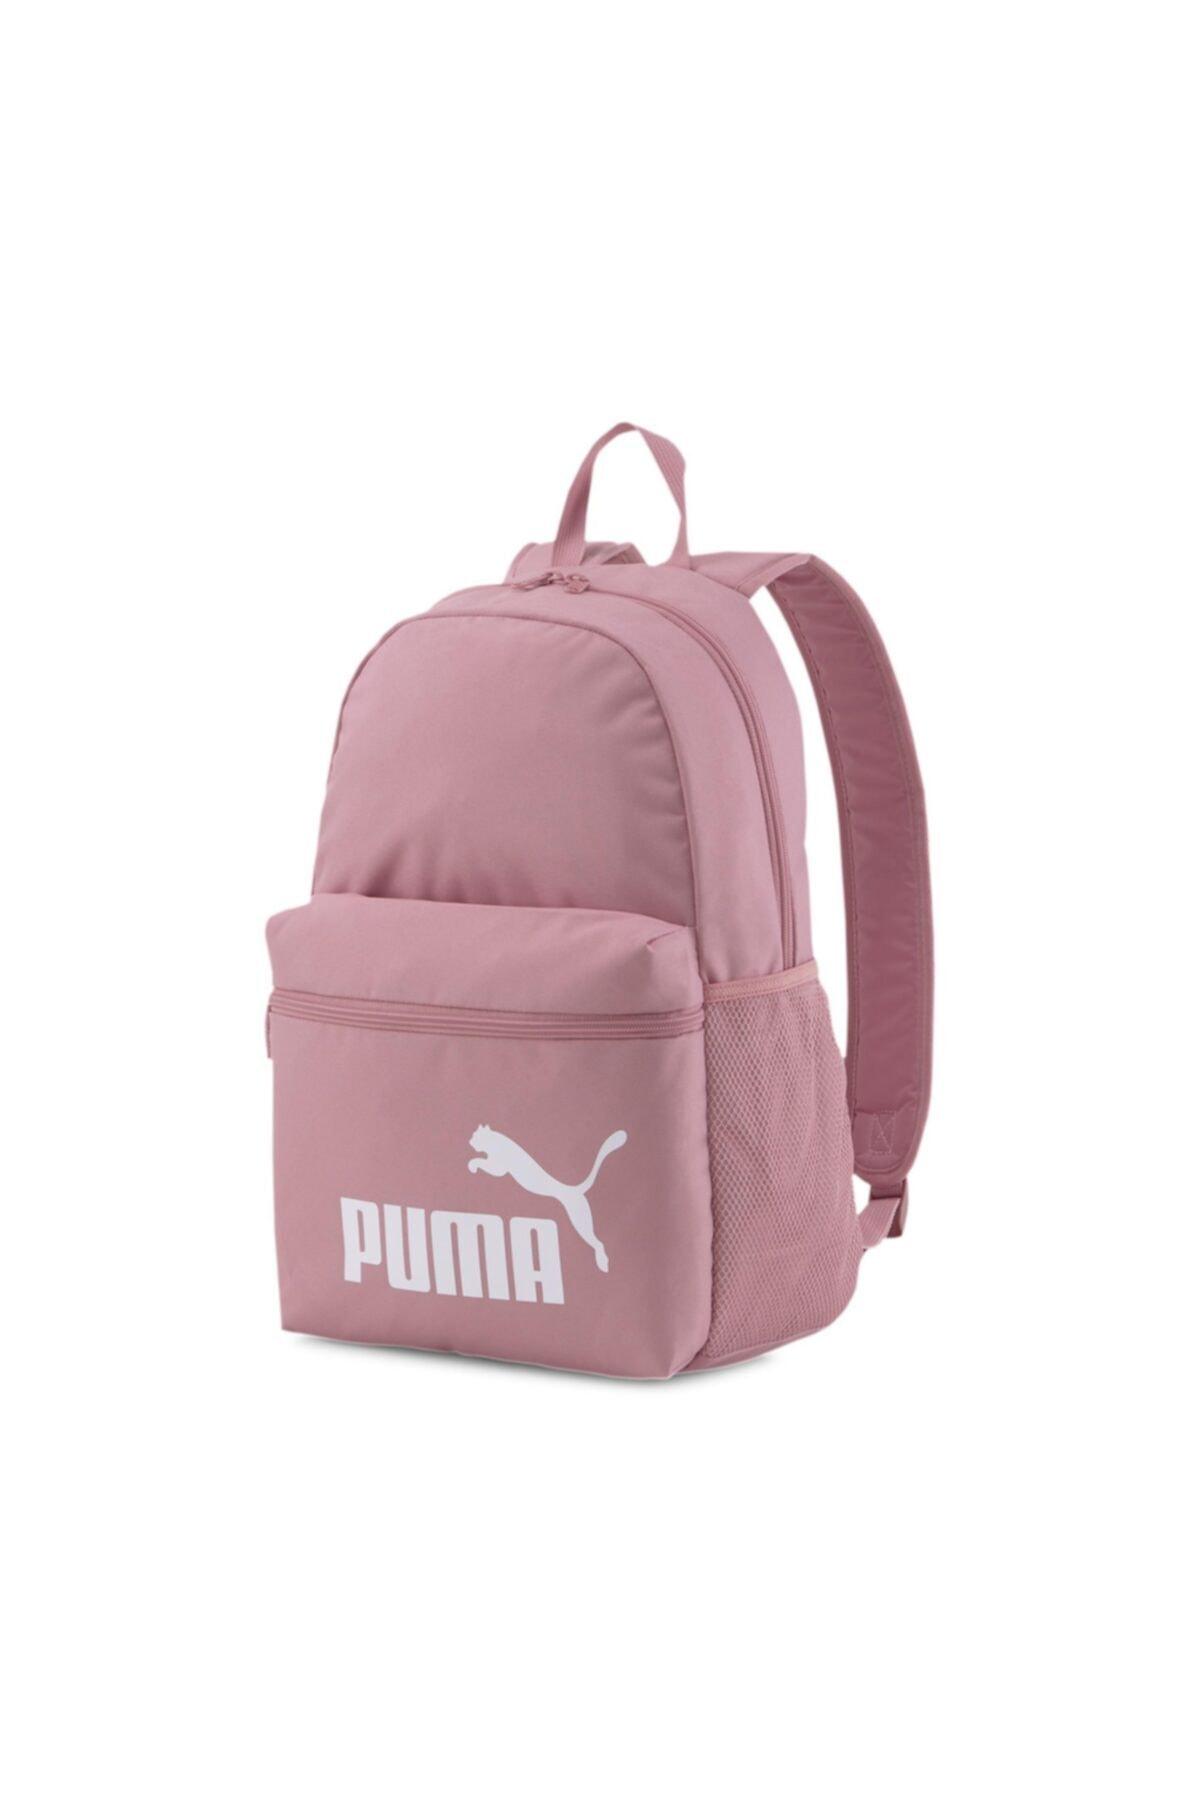 Puma Phase Backpack Foxglove Sırt Ve Okul Çantası 43x 29 X 16 cm 075487-44 2